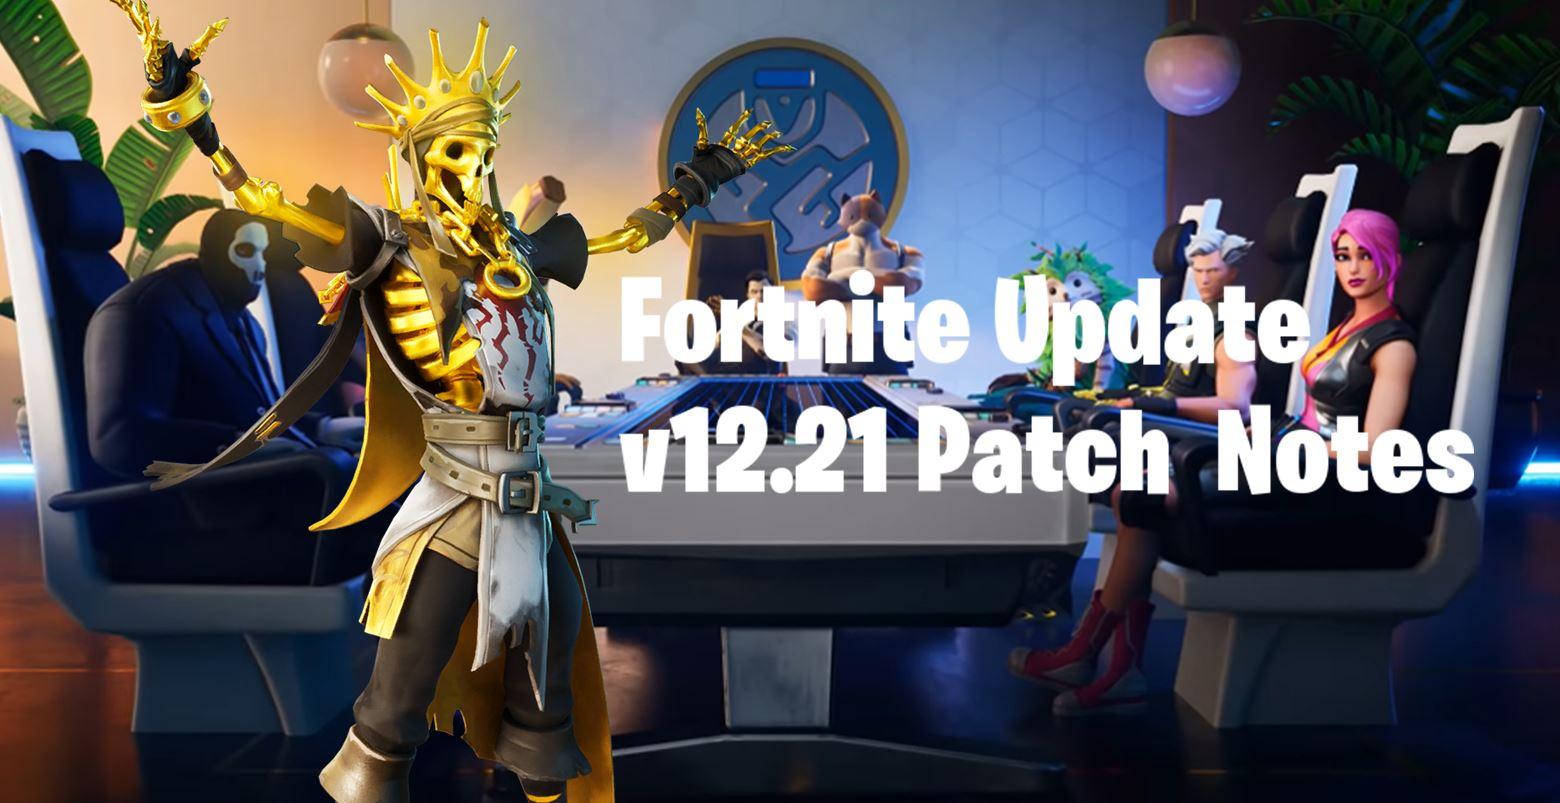 Fortnite v12.21 Update Patch Notes